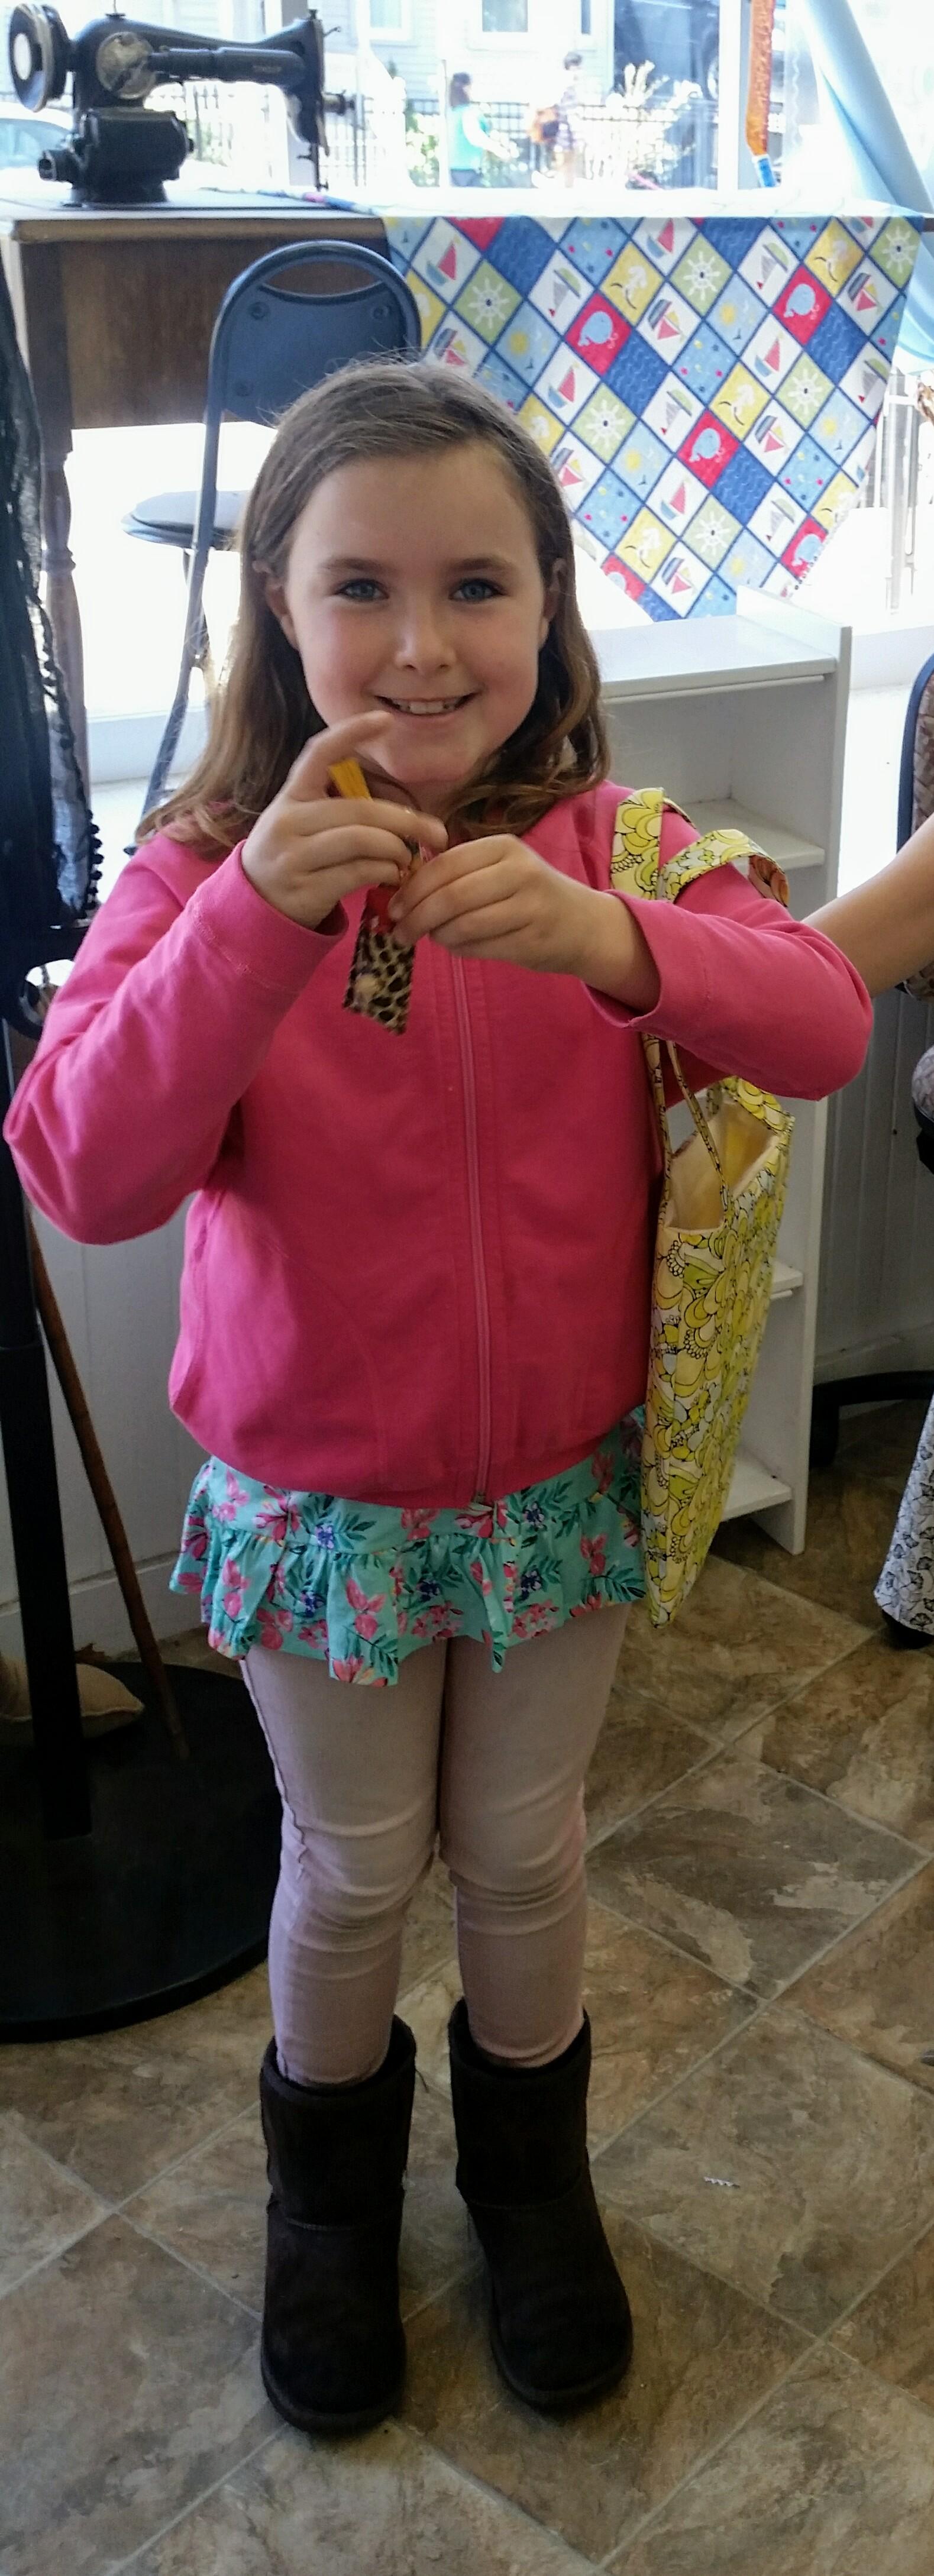 Georgia with her creations - chapstick holder and a handbag!